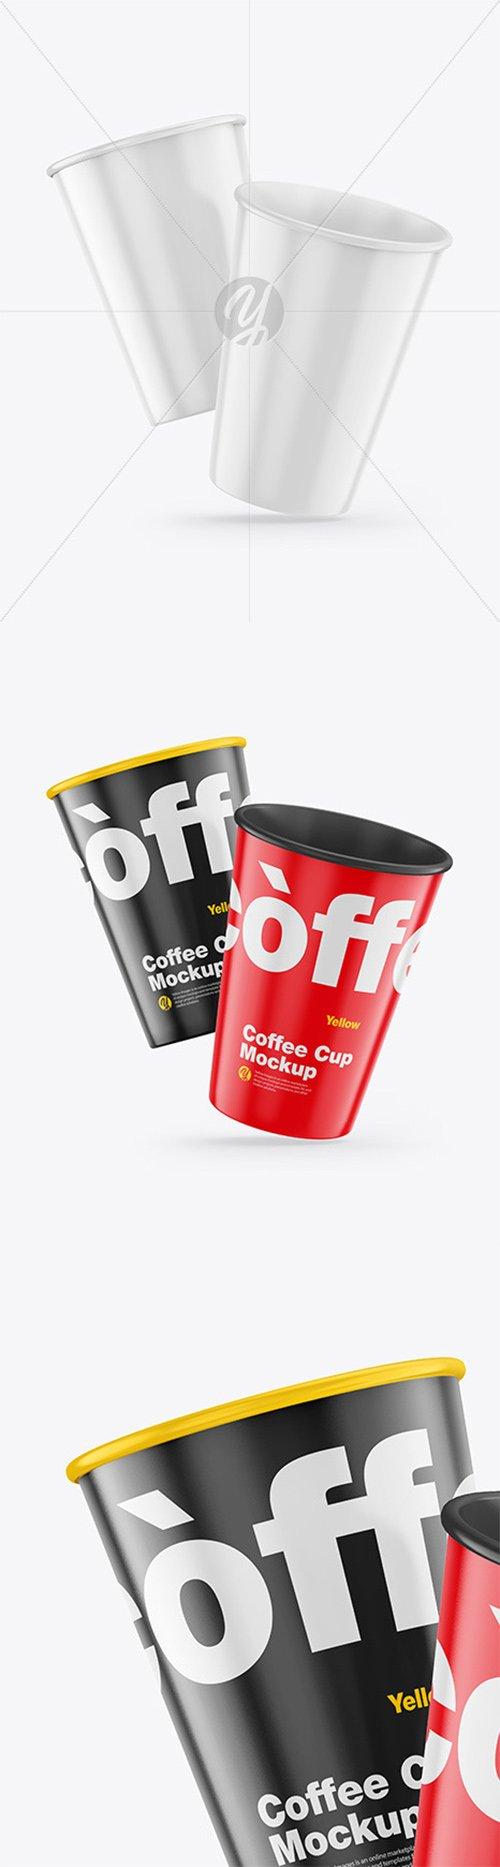 Glossy Coffee Cups Mockup 64931 TIF